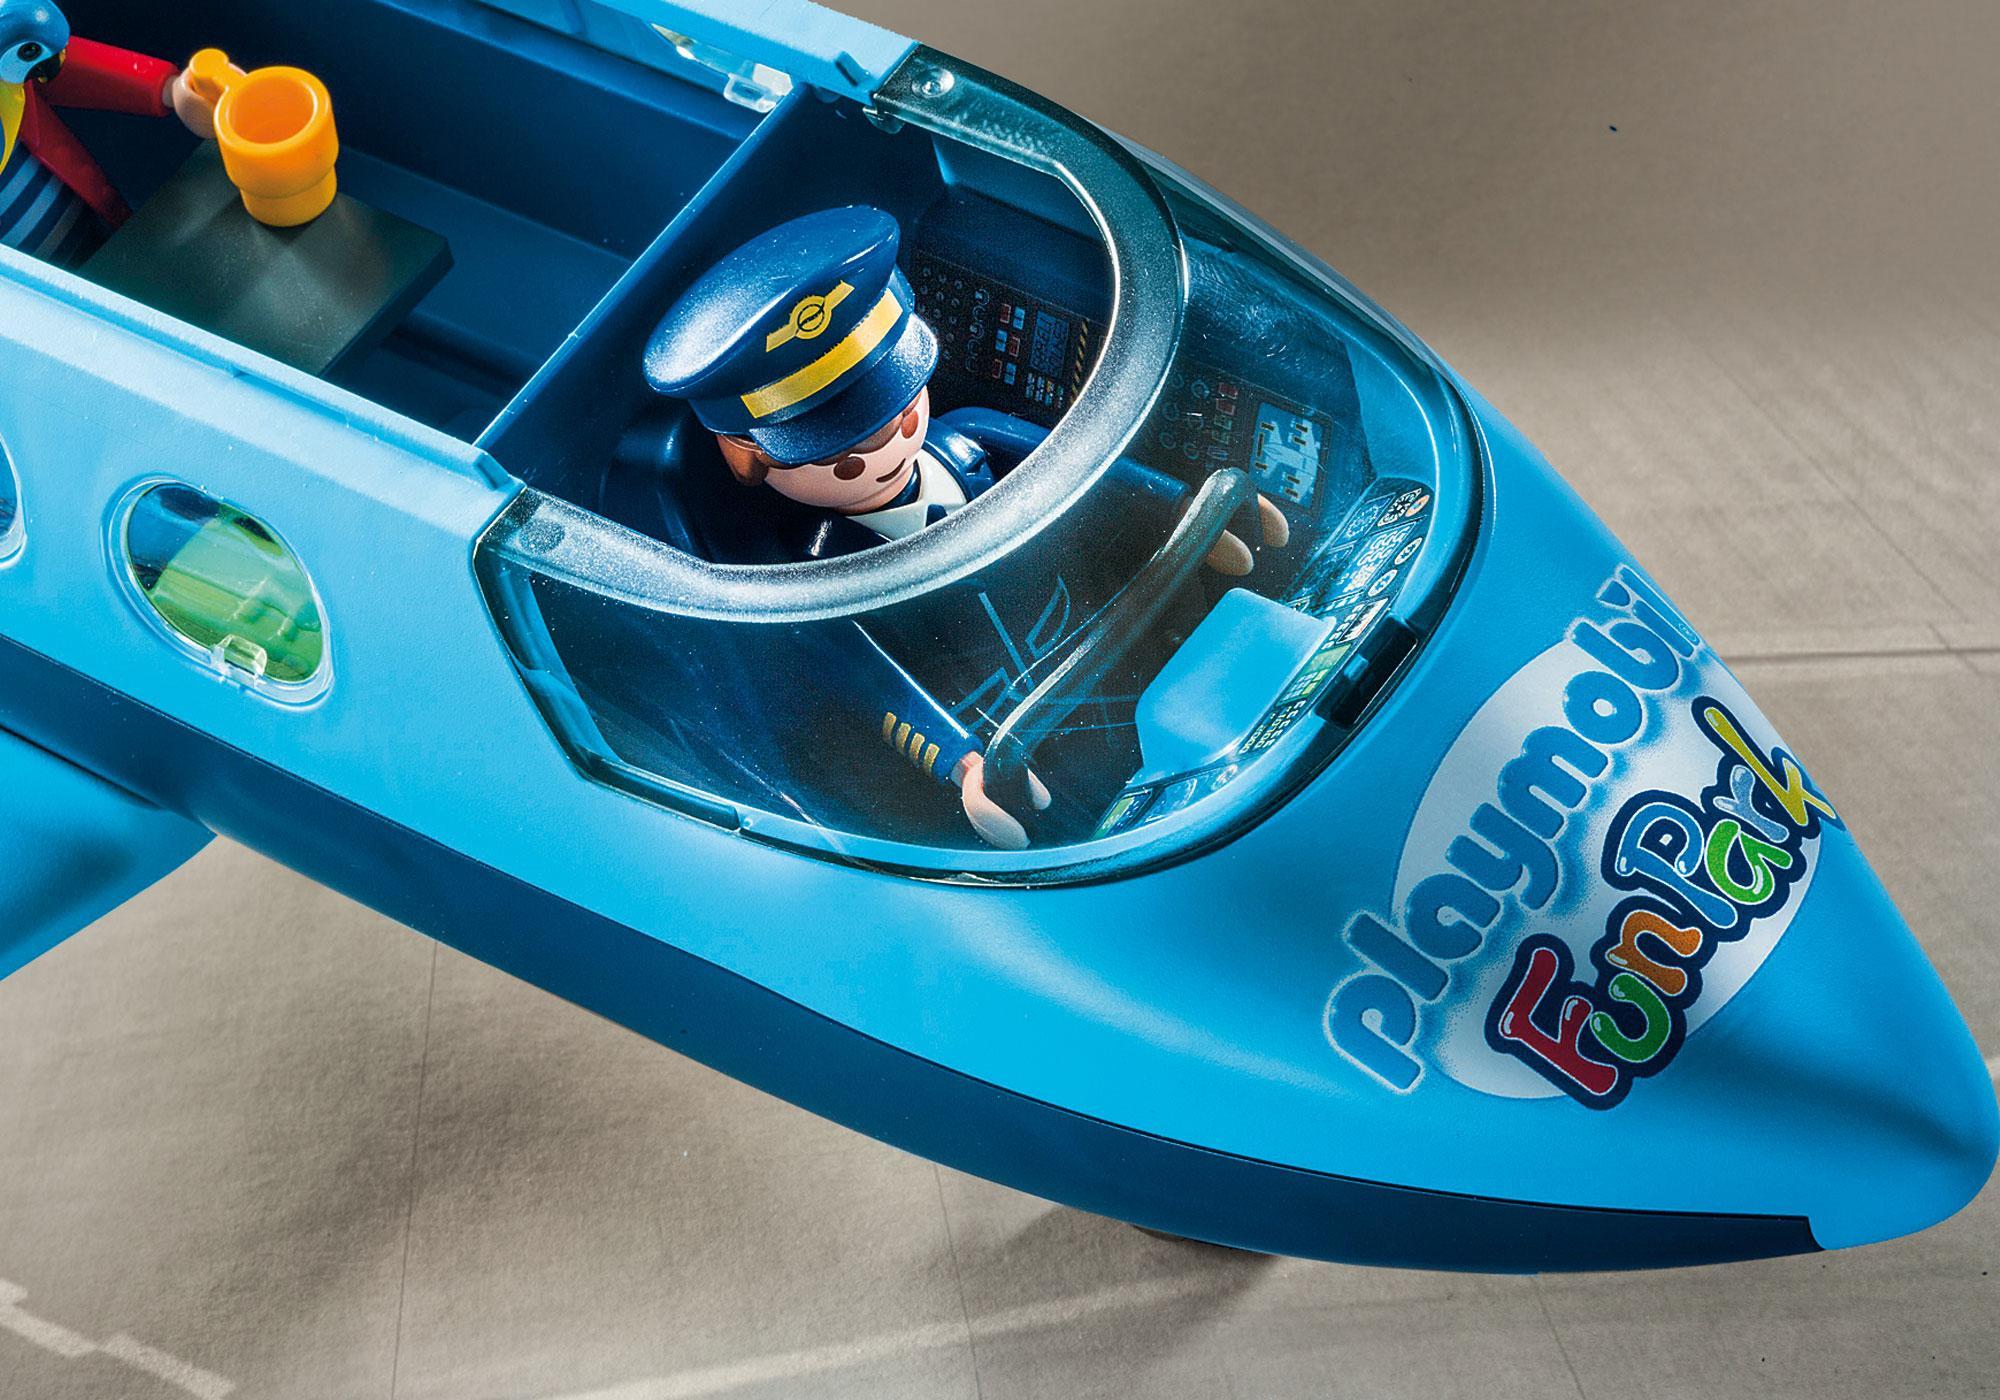 http://media.playmobil.com/i/playmobil/9366_product_extra3/PLAYMOBIL-FunPark Summer Jet